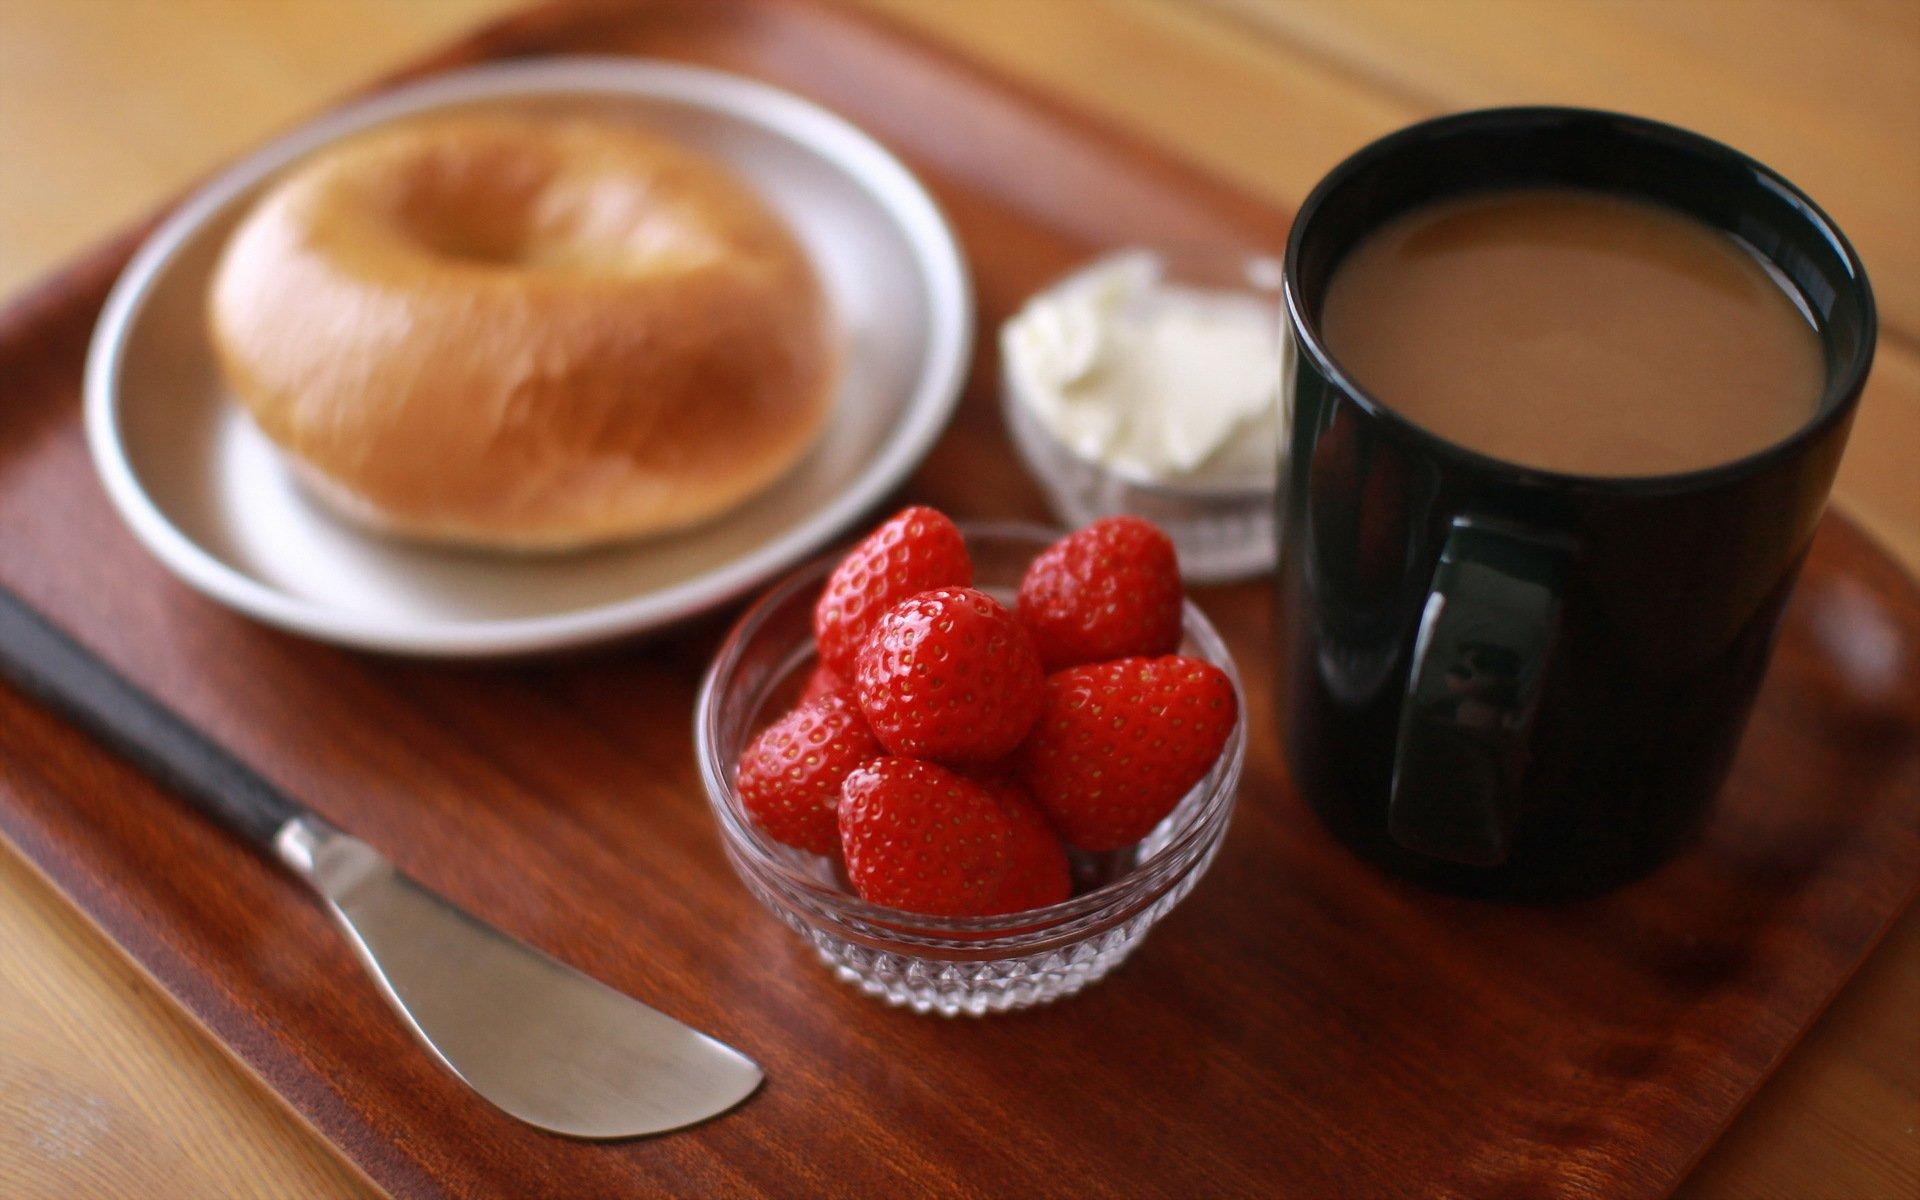 wallpapers breakfast food: Breakfast Full HD Wallpaper And Background